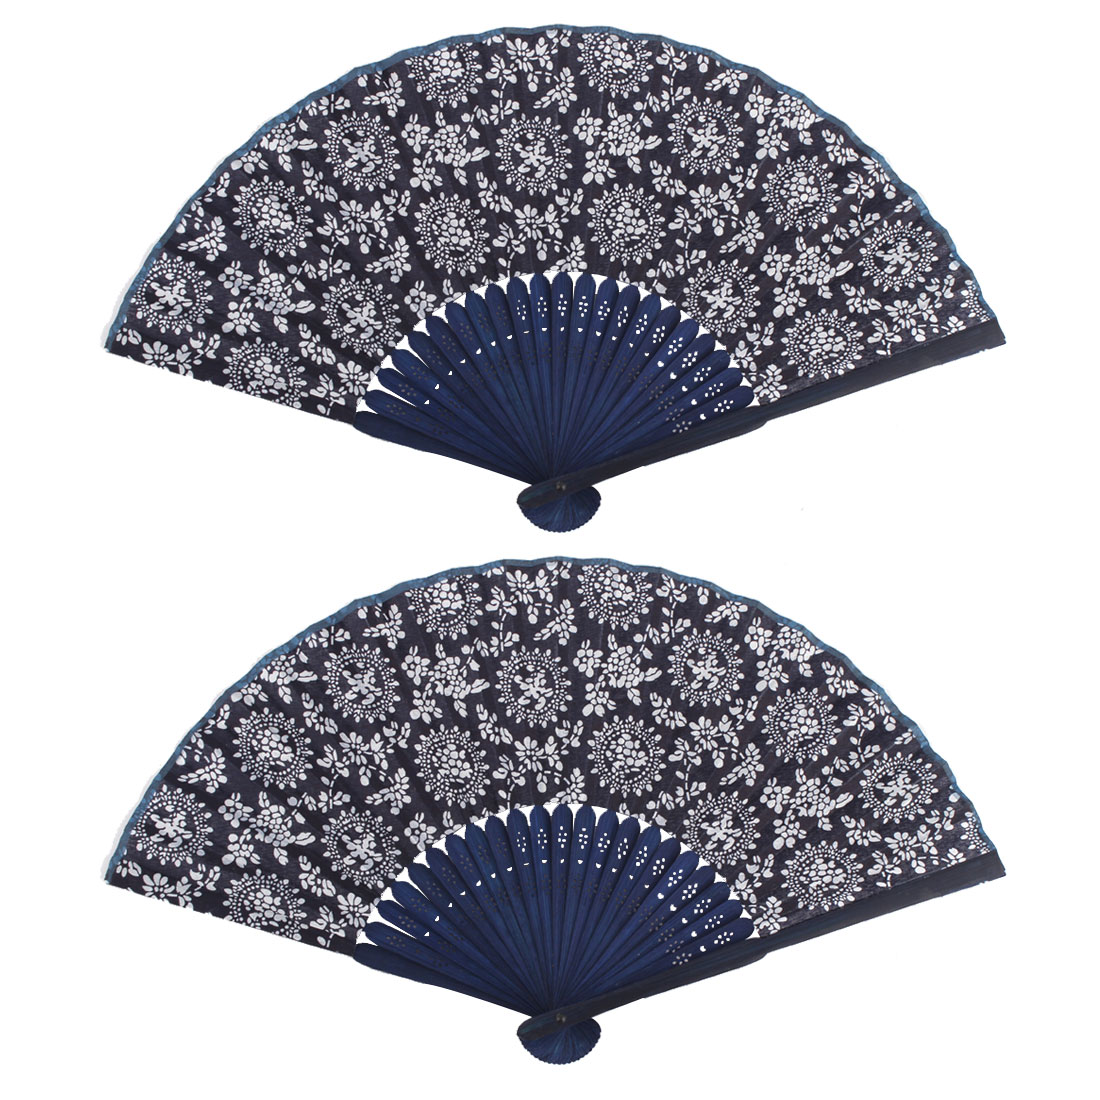 Boutique Bamboo Frame Flower Pattern Decorations Oriental Folding Fan 2 PCS